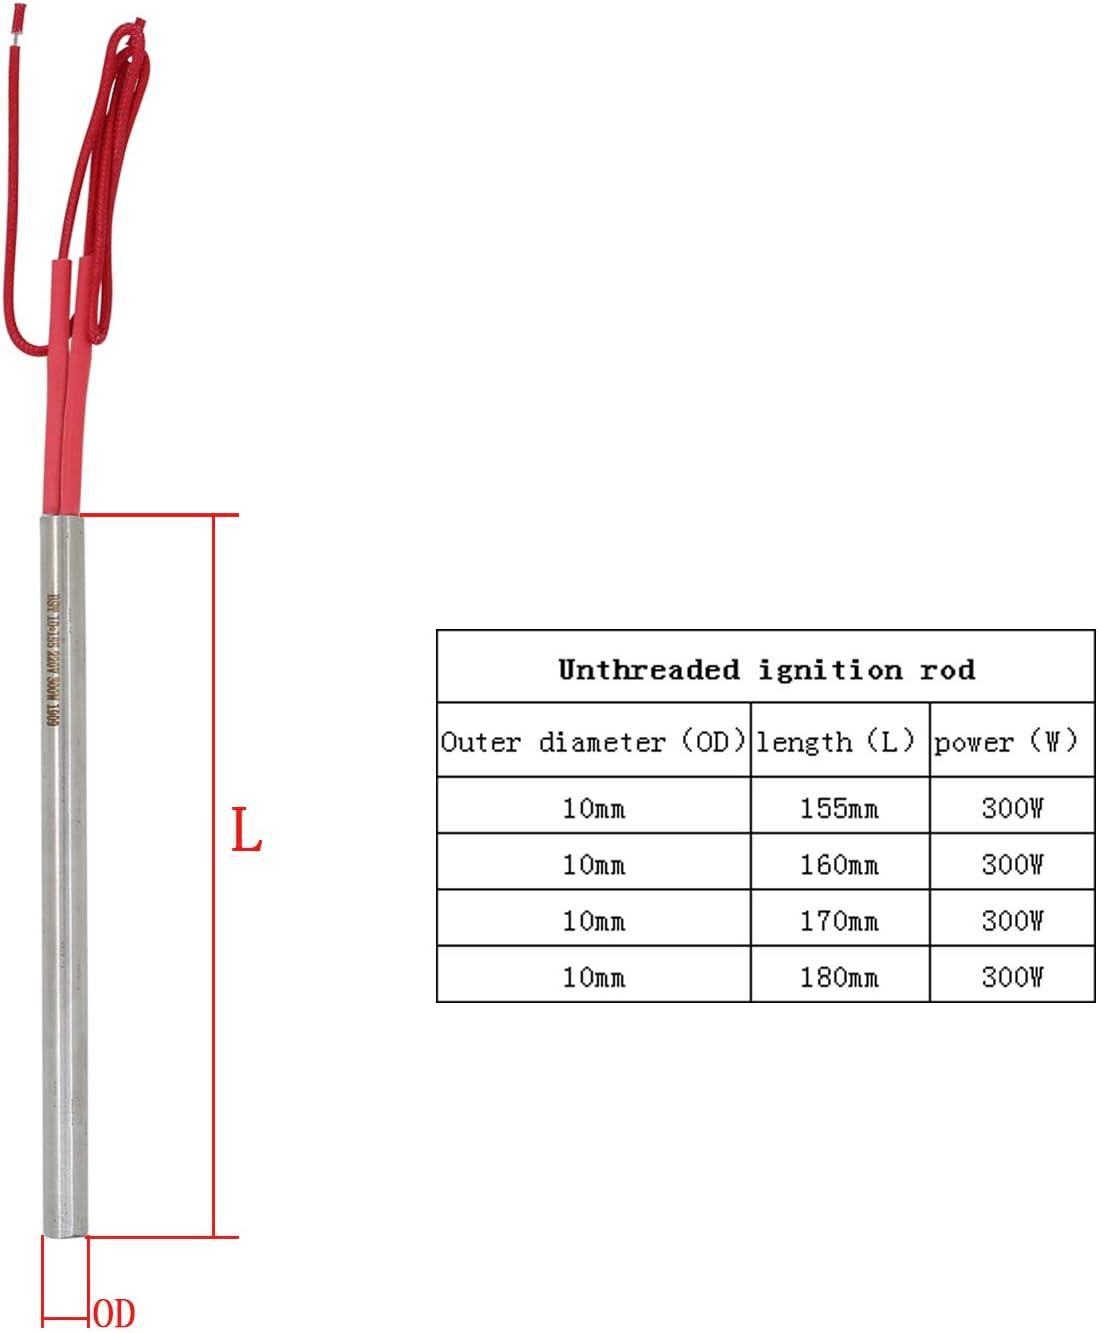 Longitud 140mm Resistencias para estufas de pellet 220v 250w /Φ 9.5mm bujia de encendido pellets 140 150 160 170 180mm